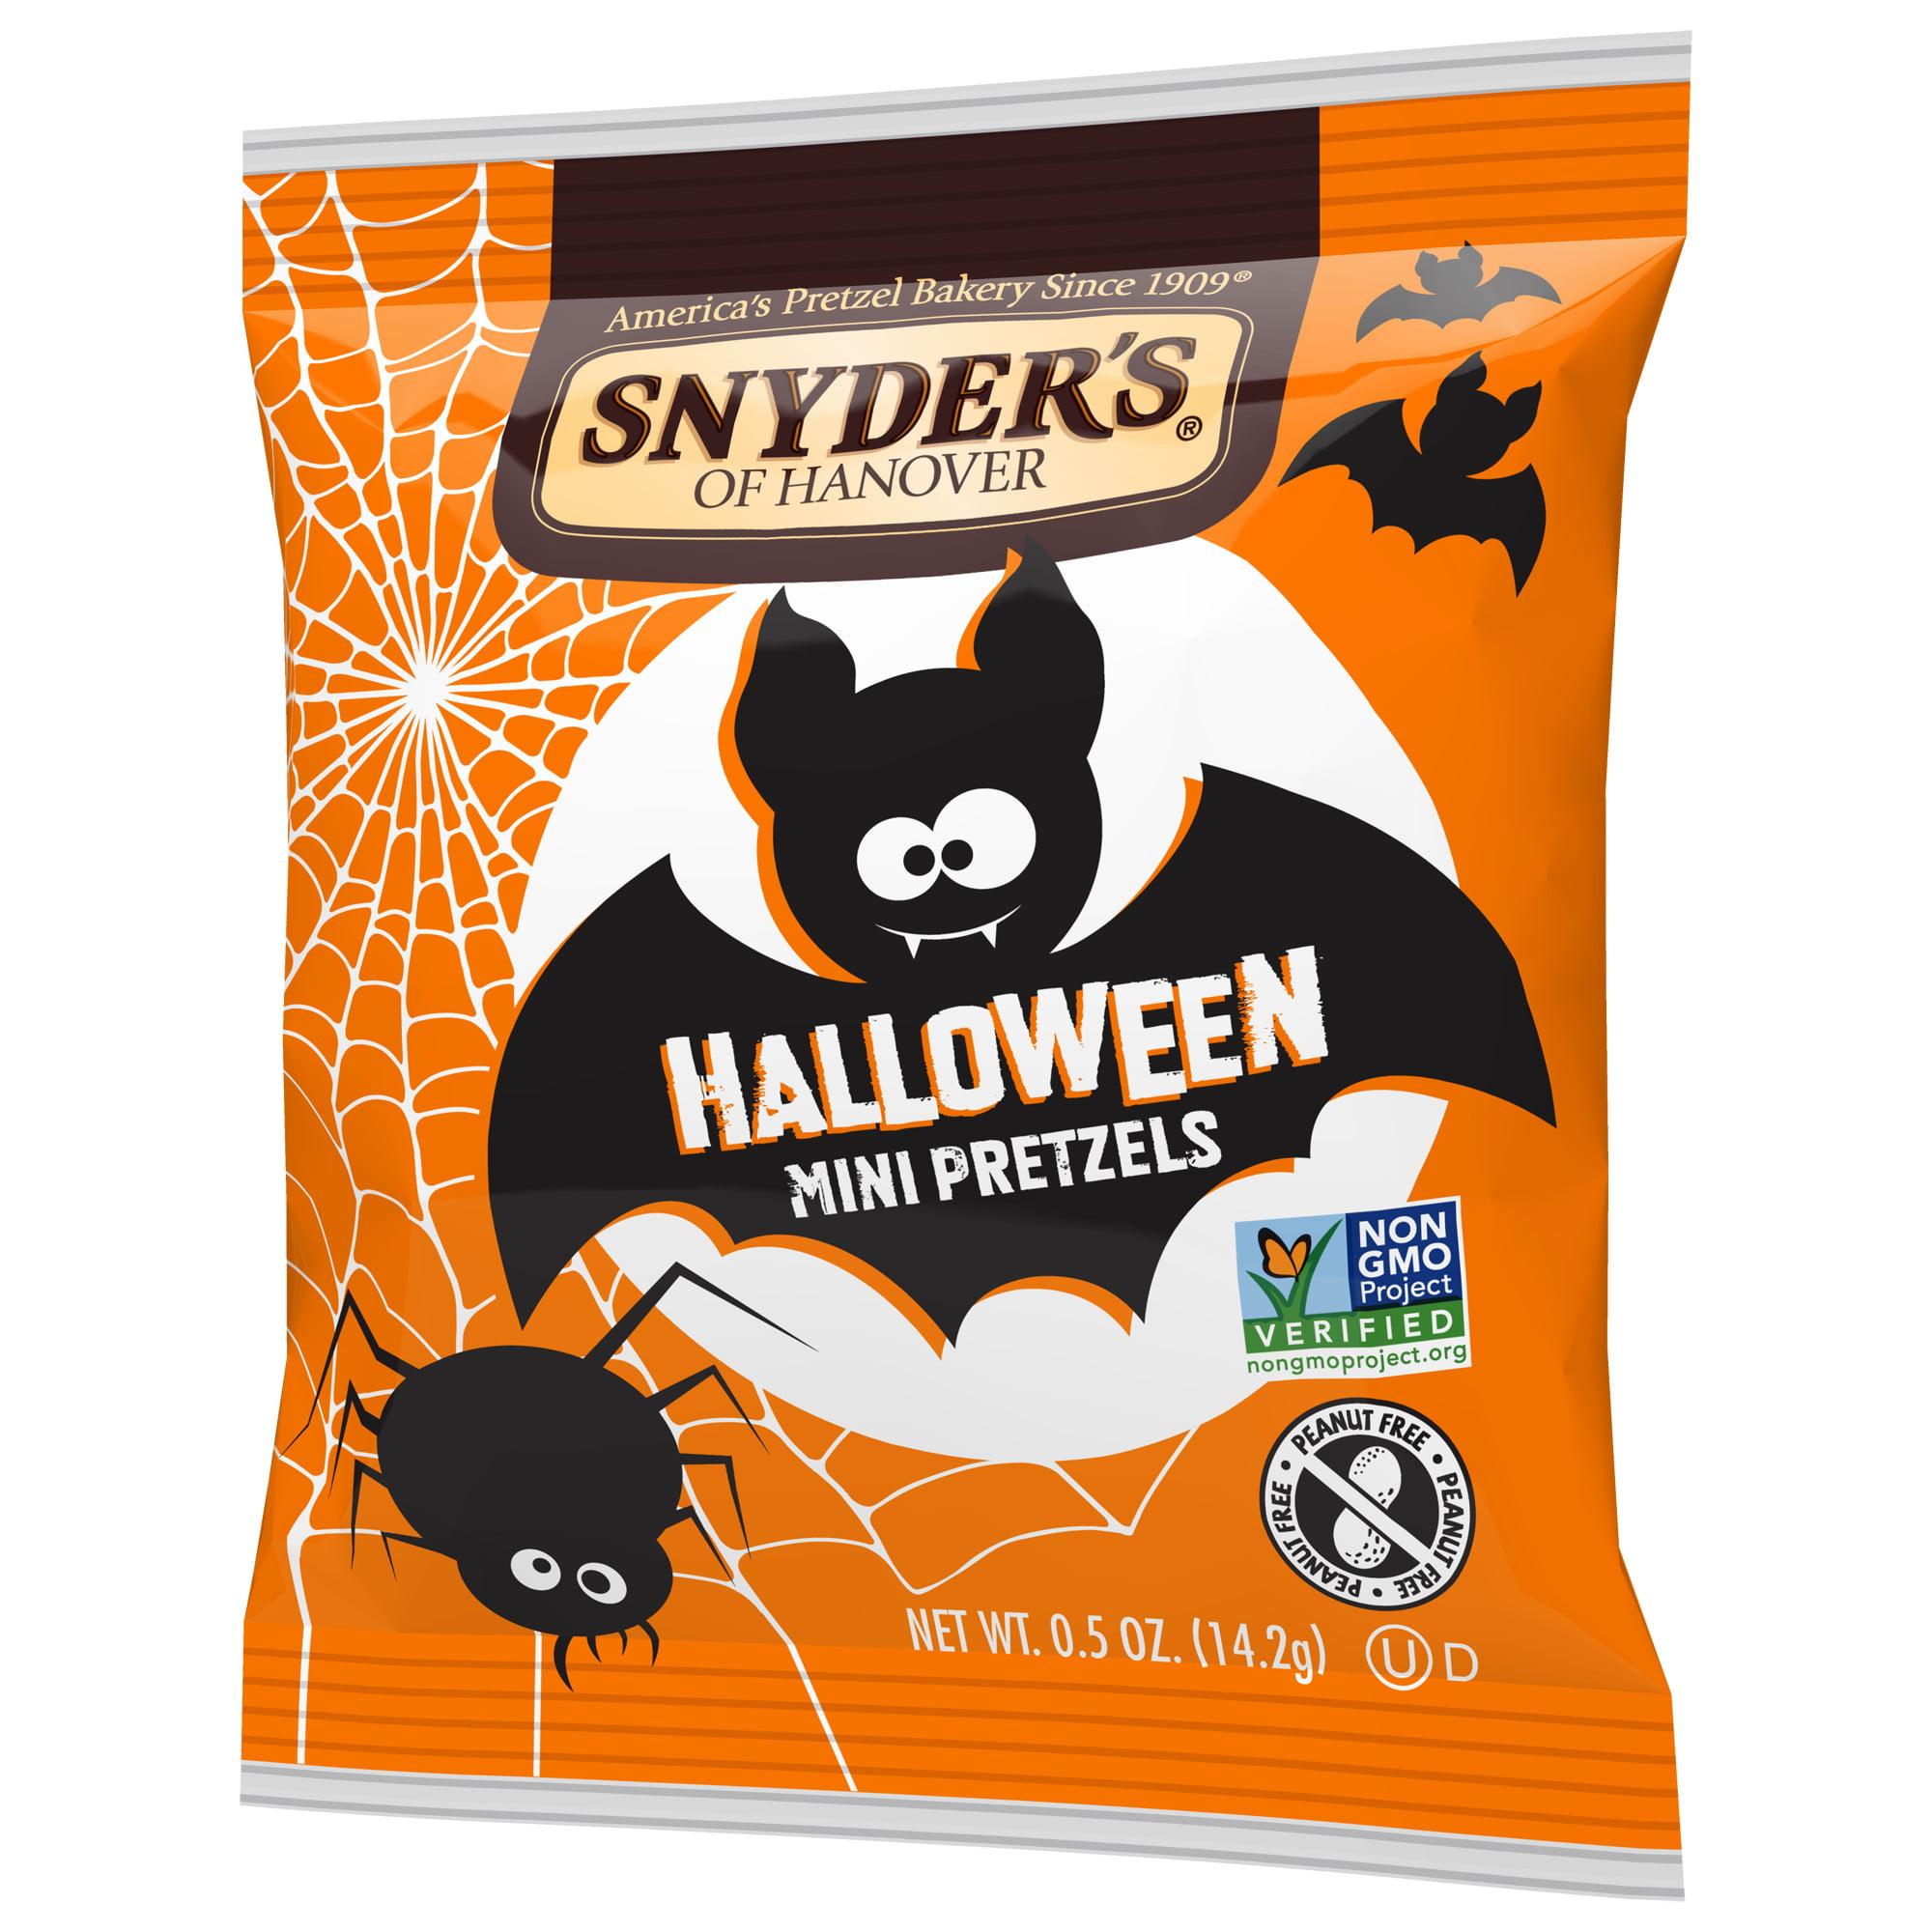 Snyder s of Hanover Mini Pretzels Halloween Trick or Treat Snack